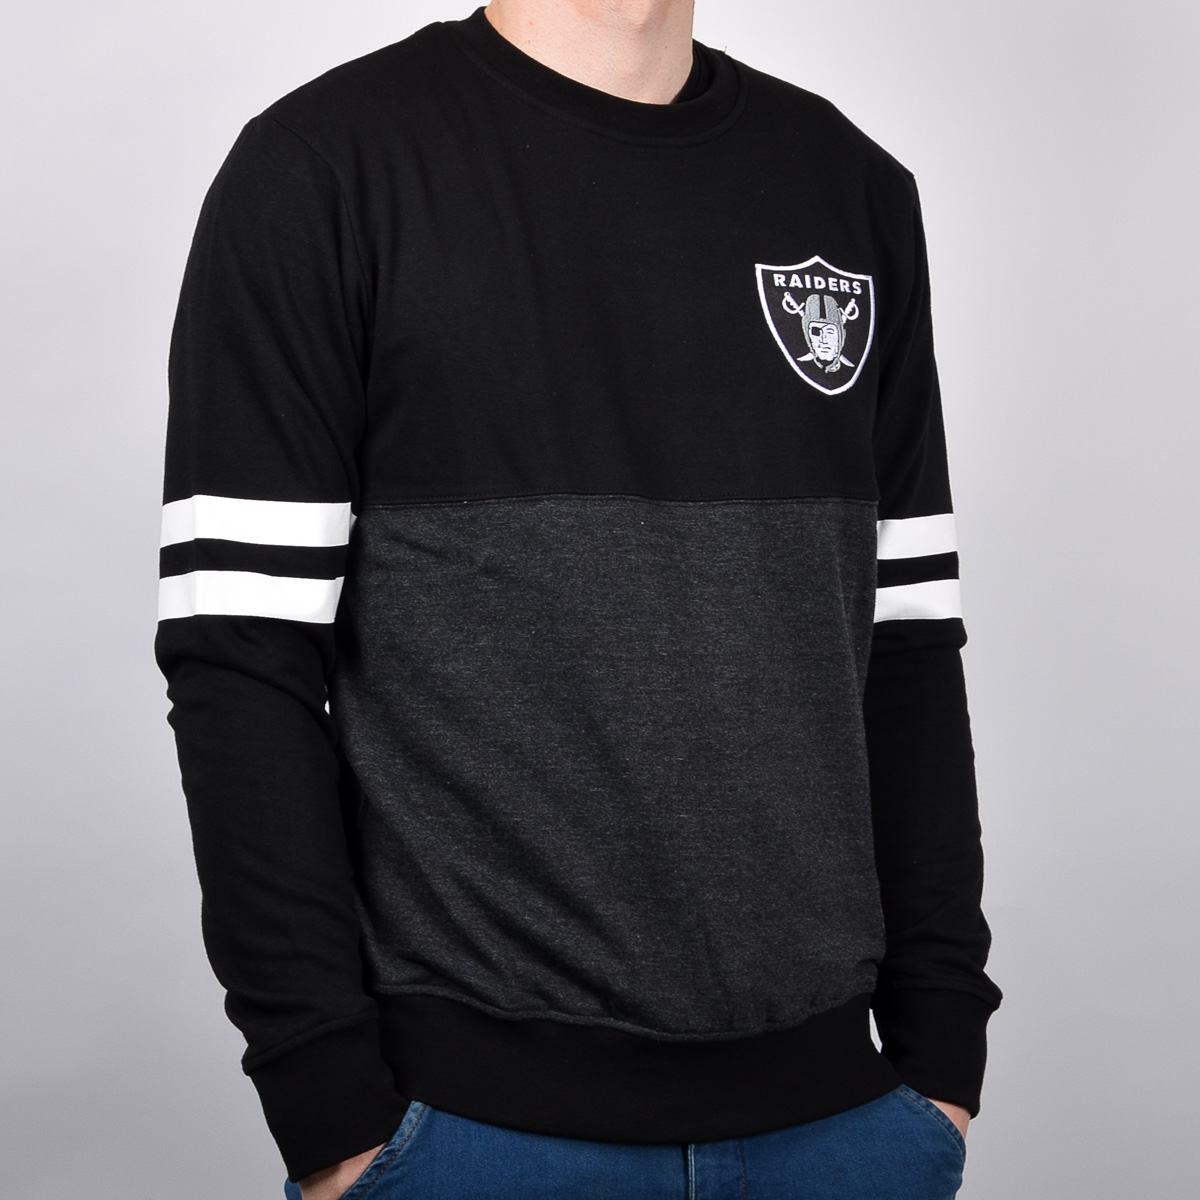 Oakland raider hoodies